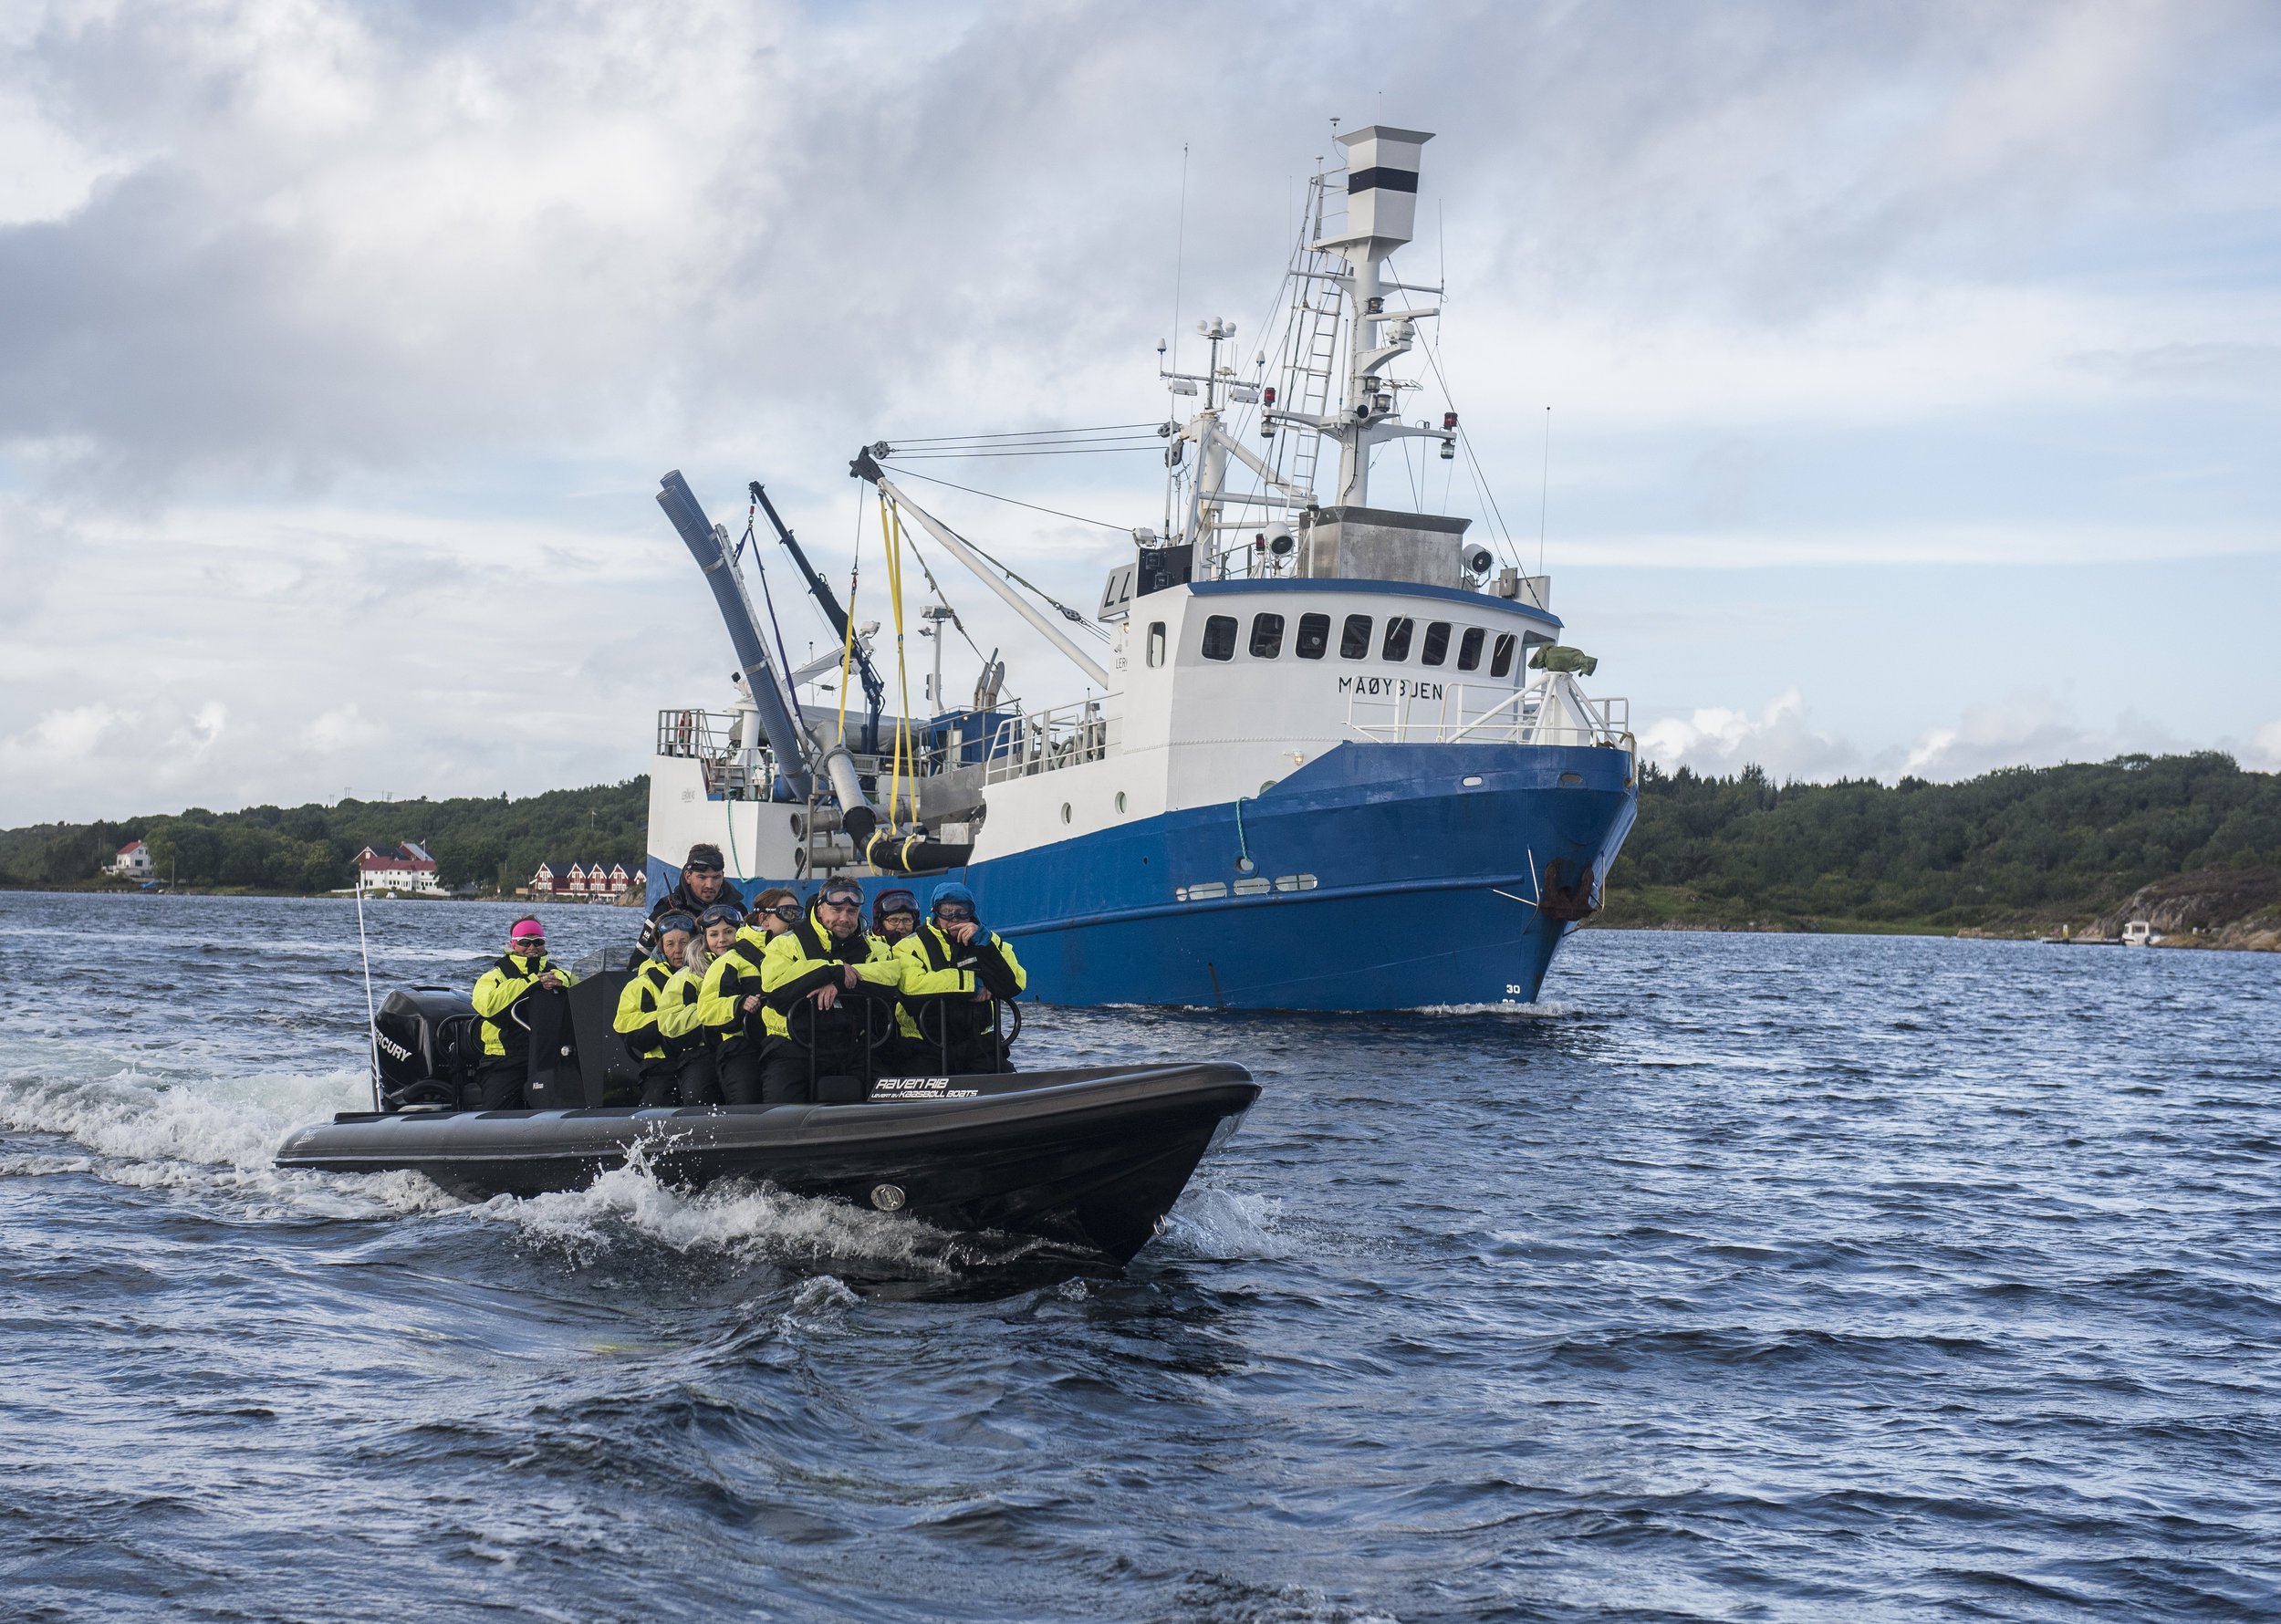 åfjord sparebank-6520.jpg